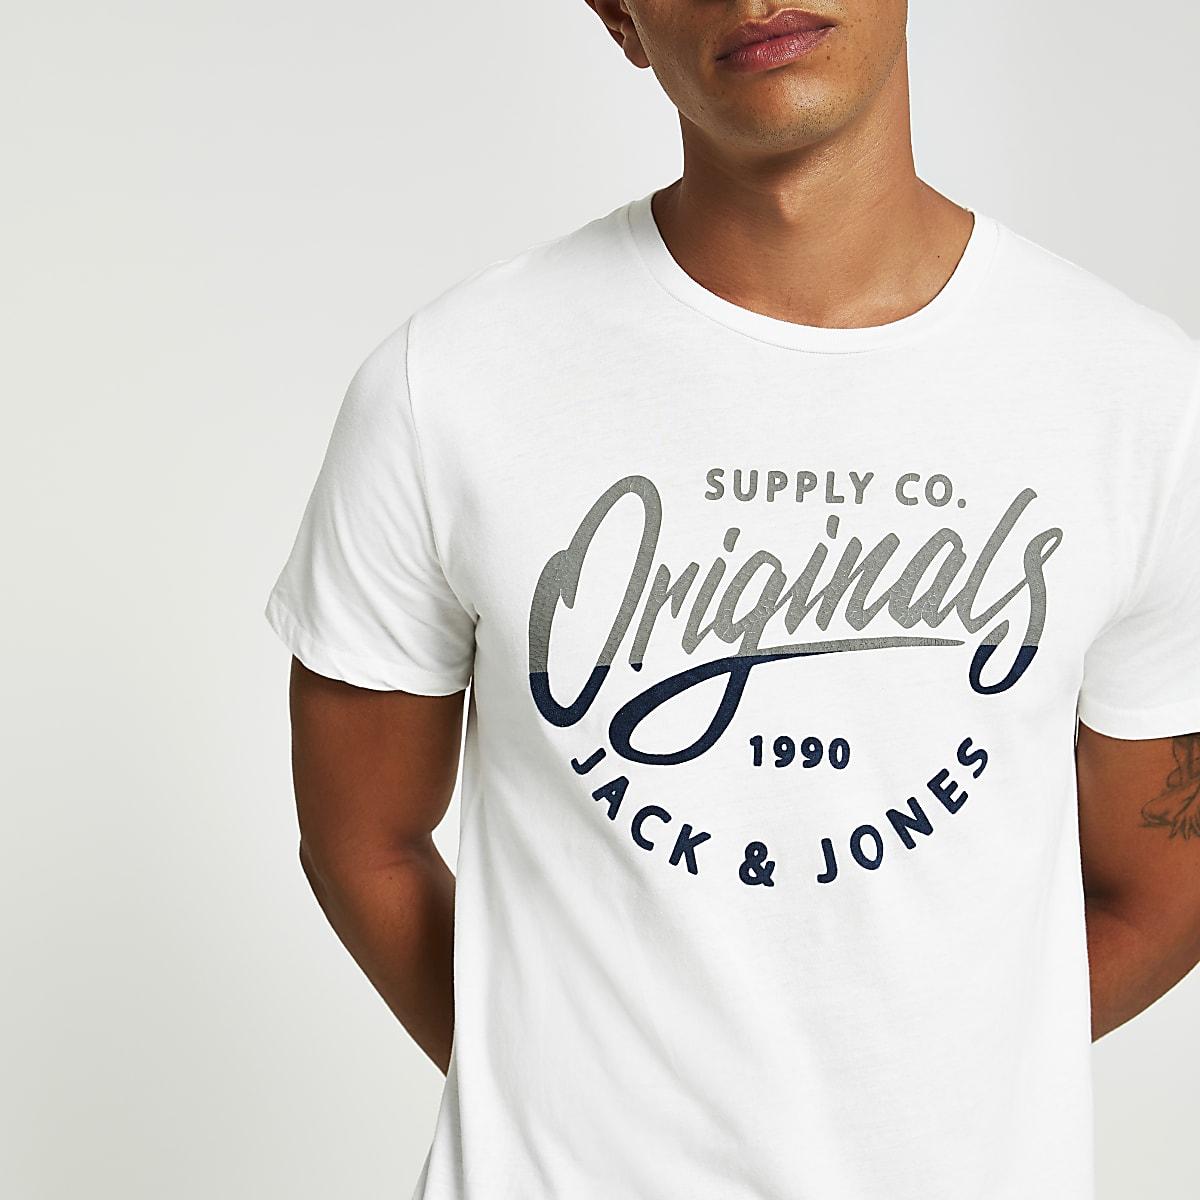 Jack and Jones white chest logo T-shirt